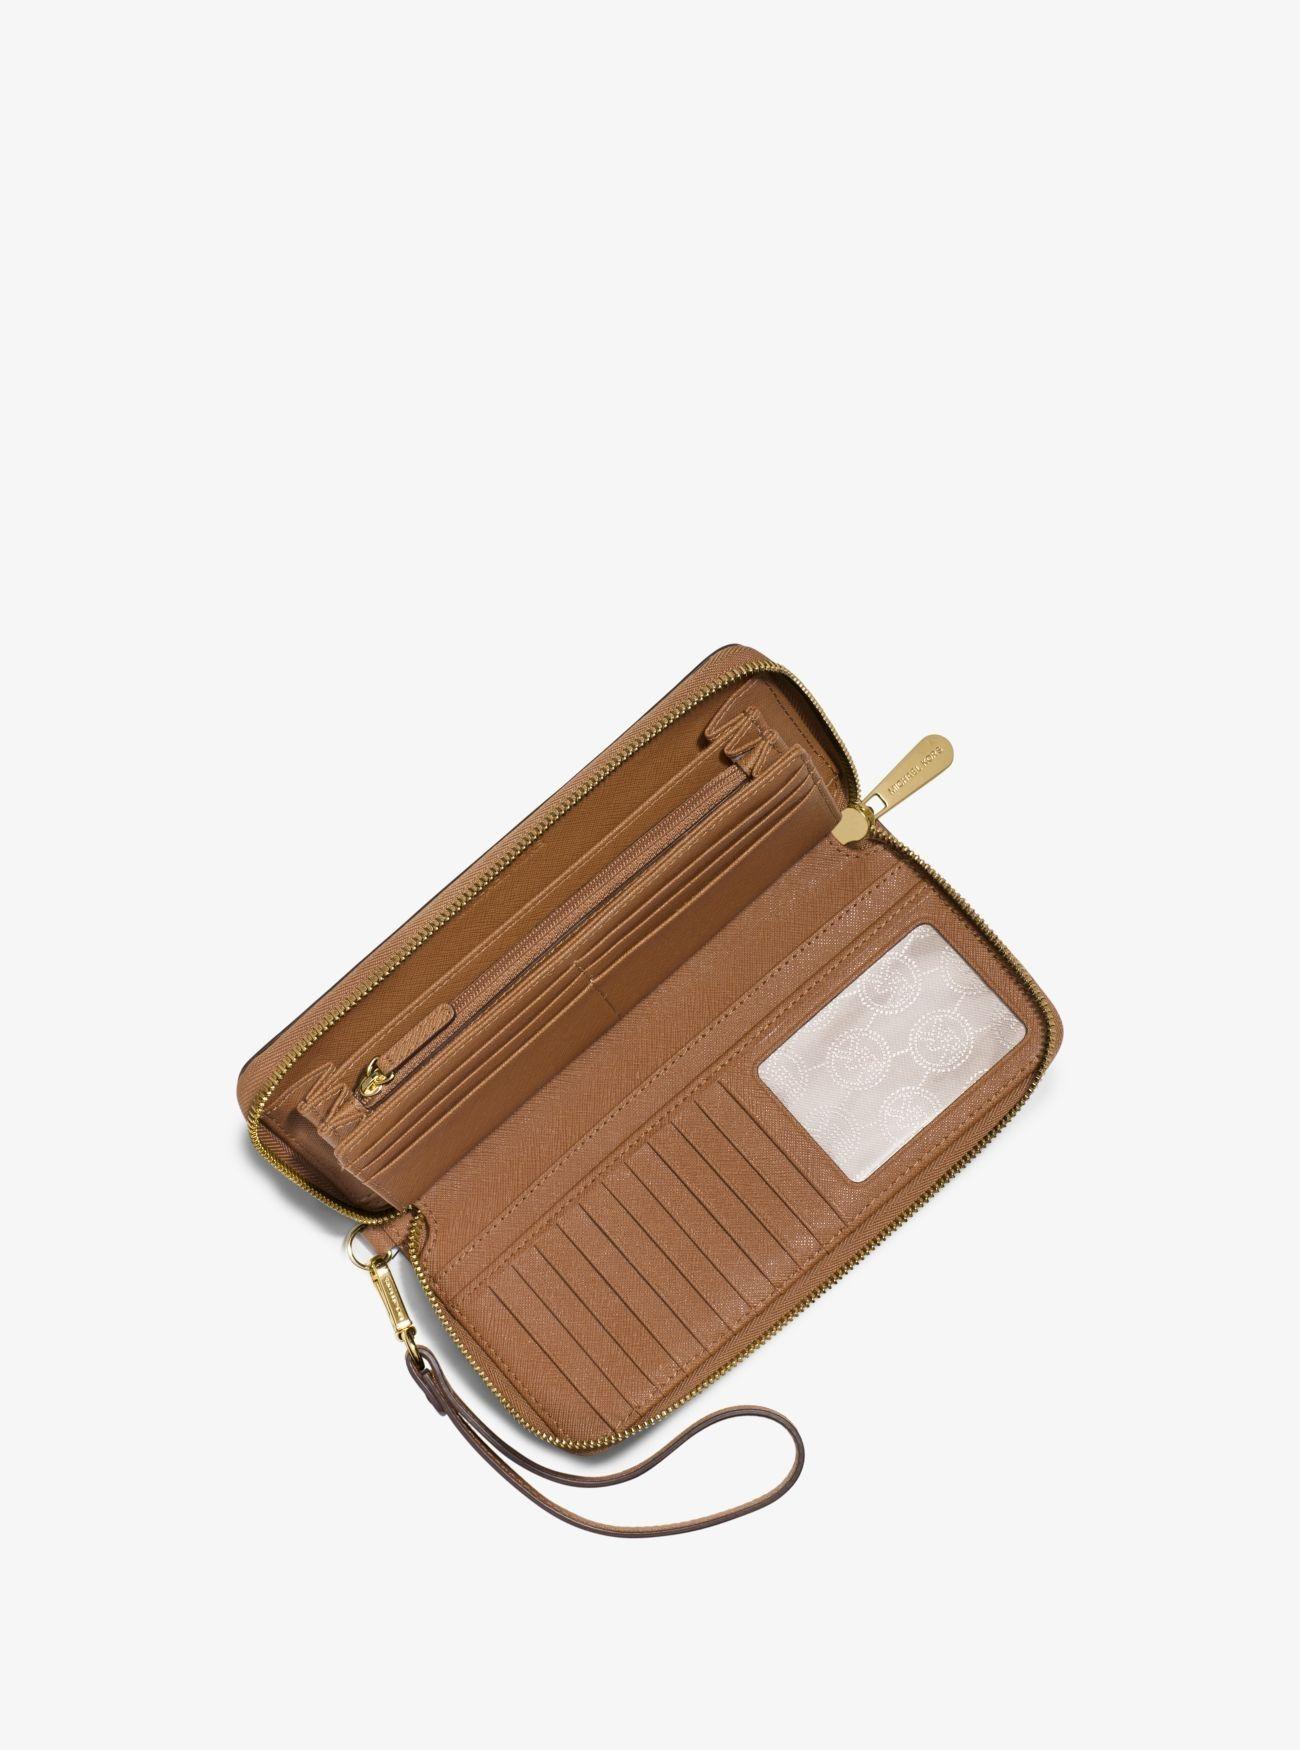 fc1a80baeff9 Online Michael Kors Acorn1 Jet Set Travel Leather Continental Wristlet Cheap